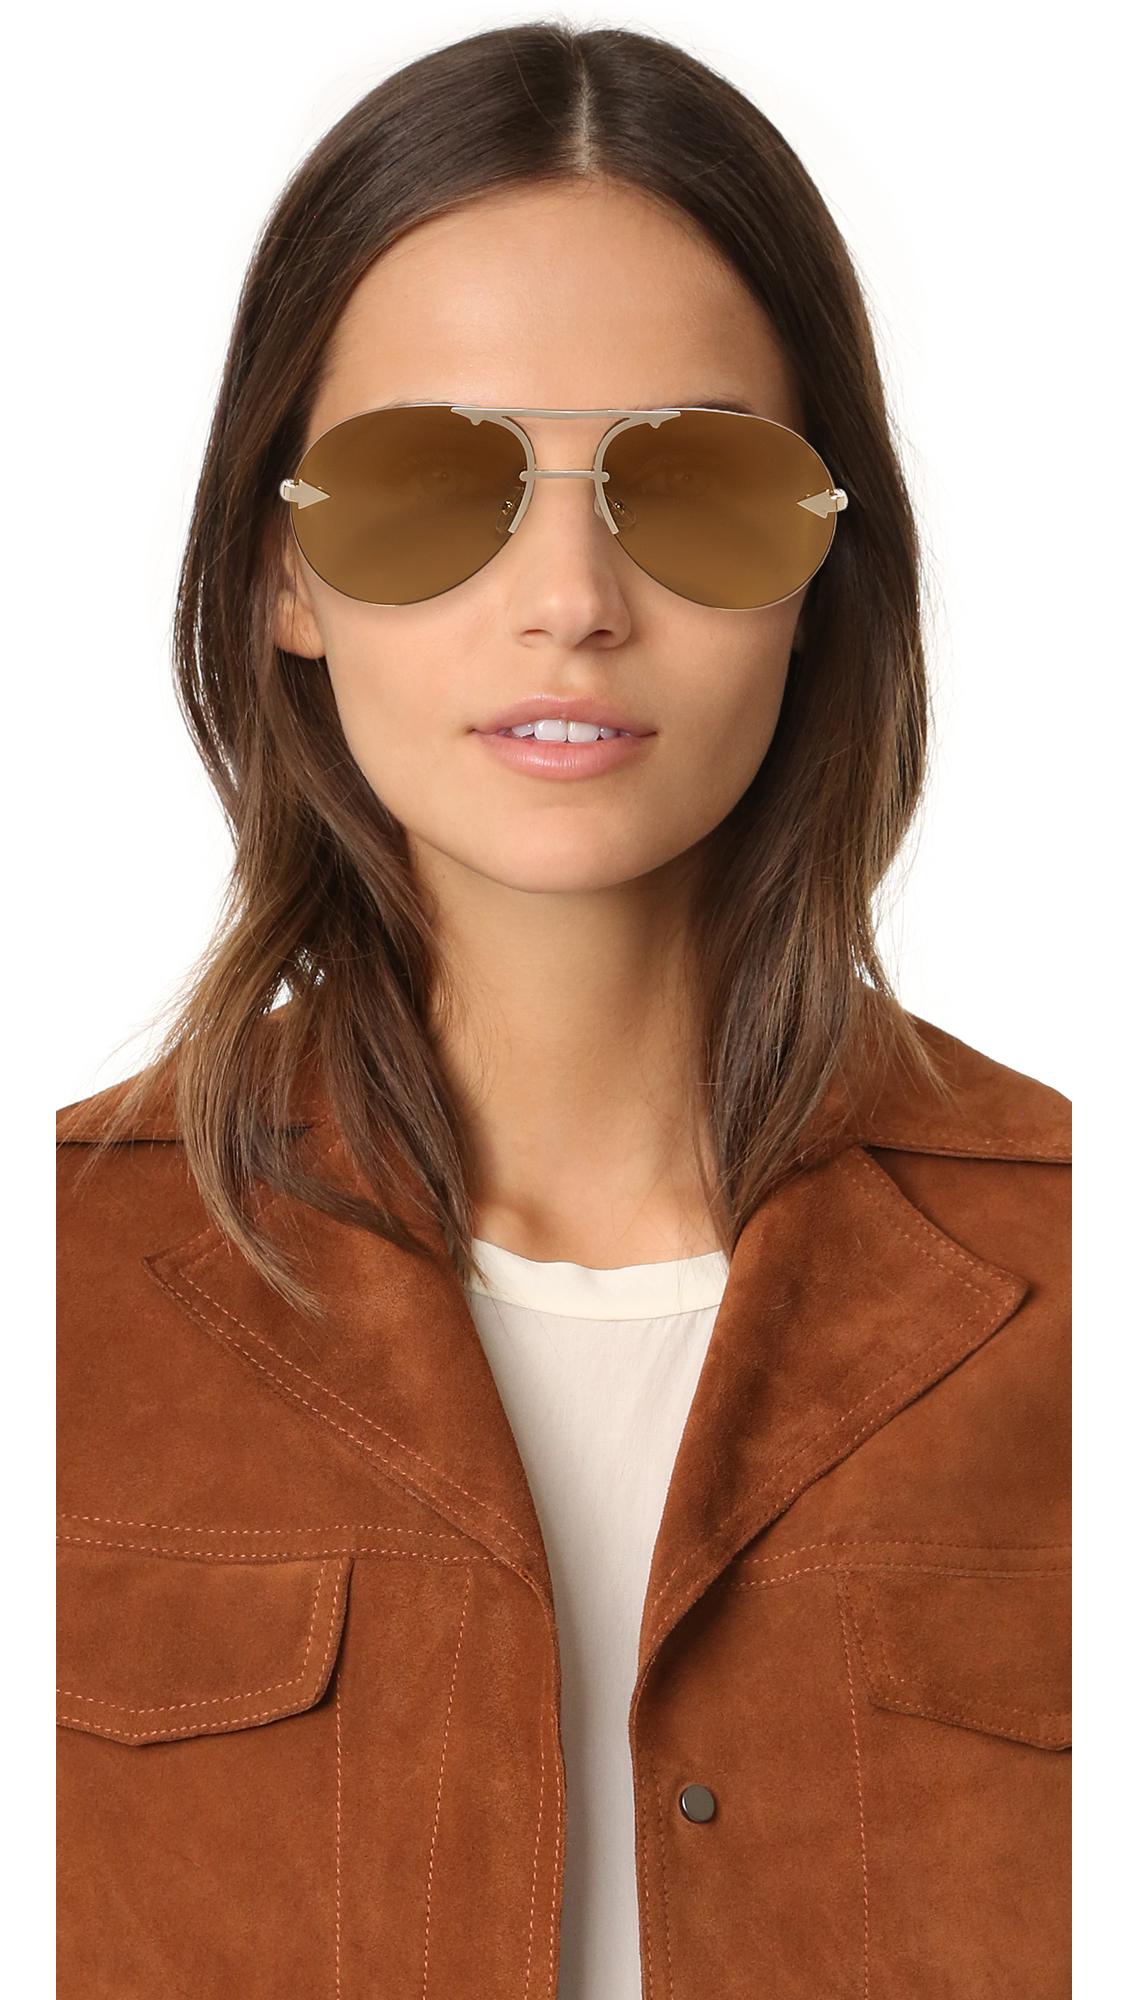 Walker sol para Karen mujer Love Gafas Hangover de de 4vwqx8